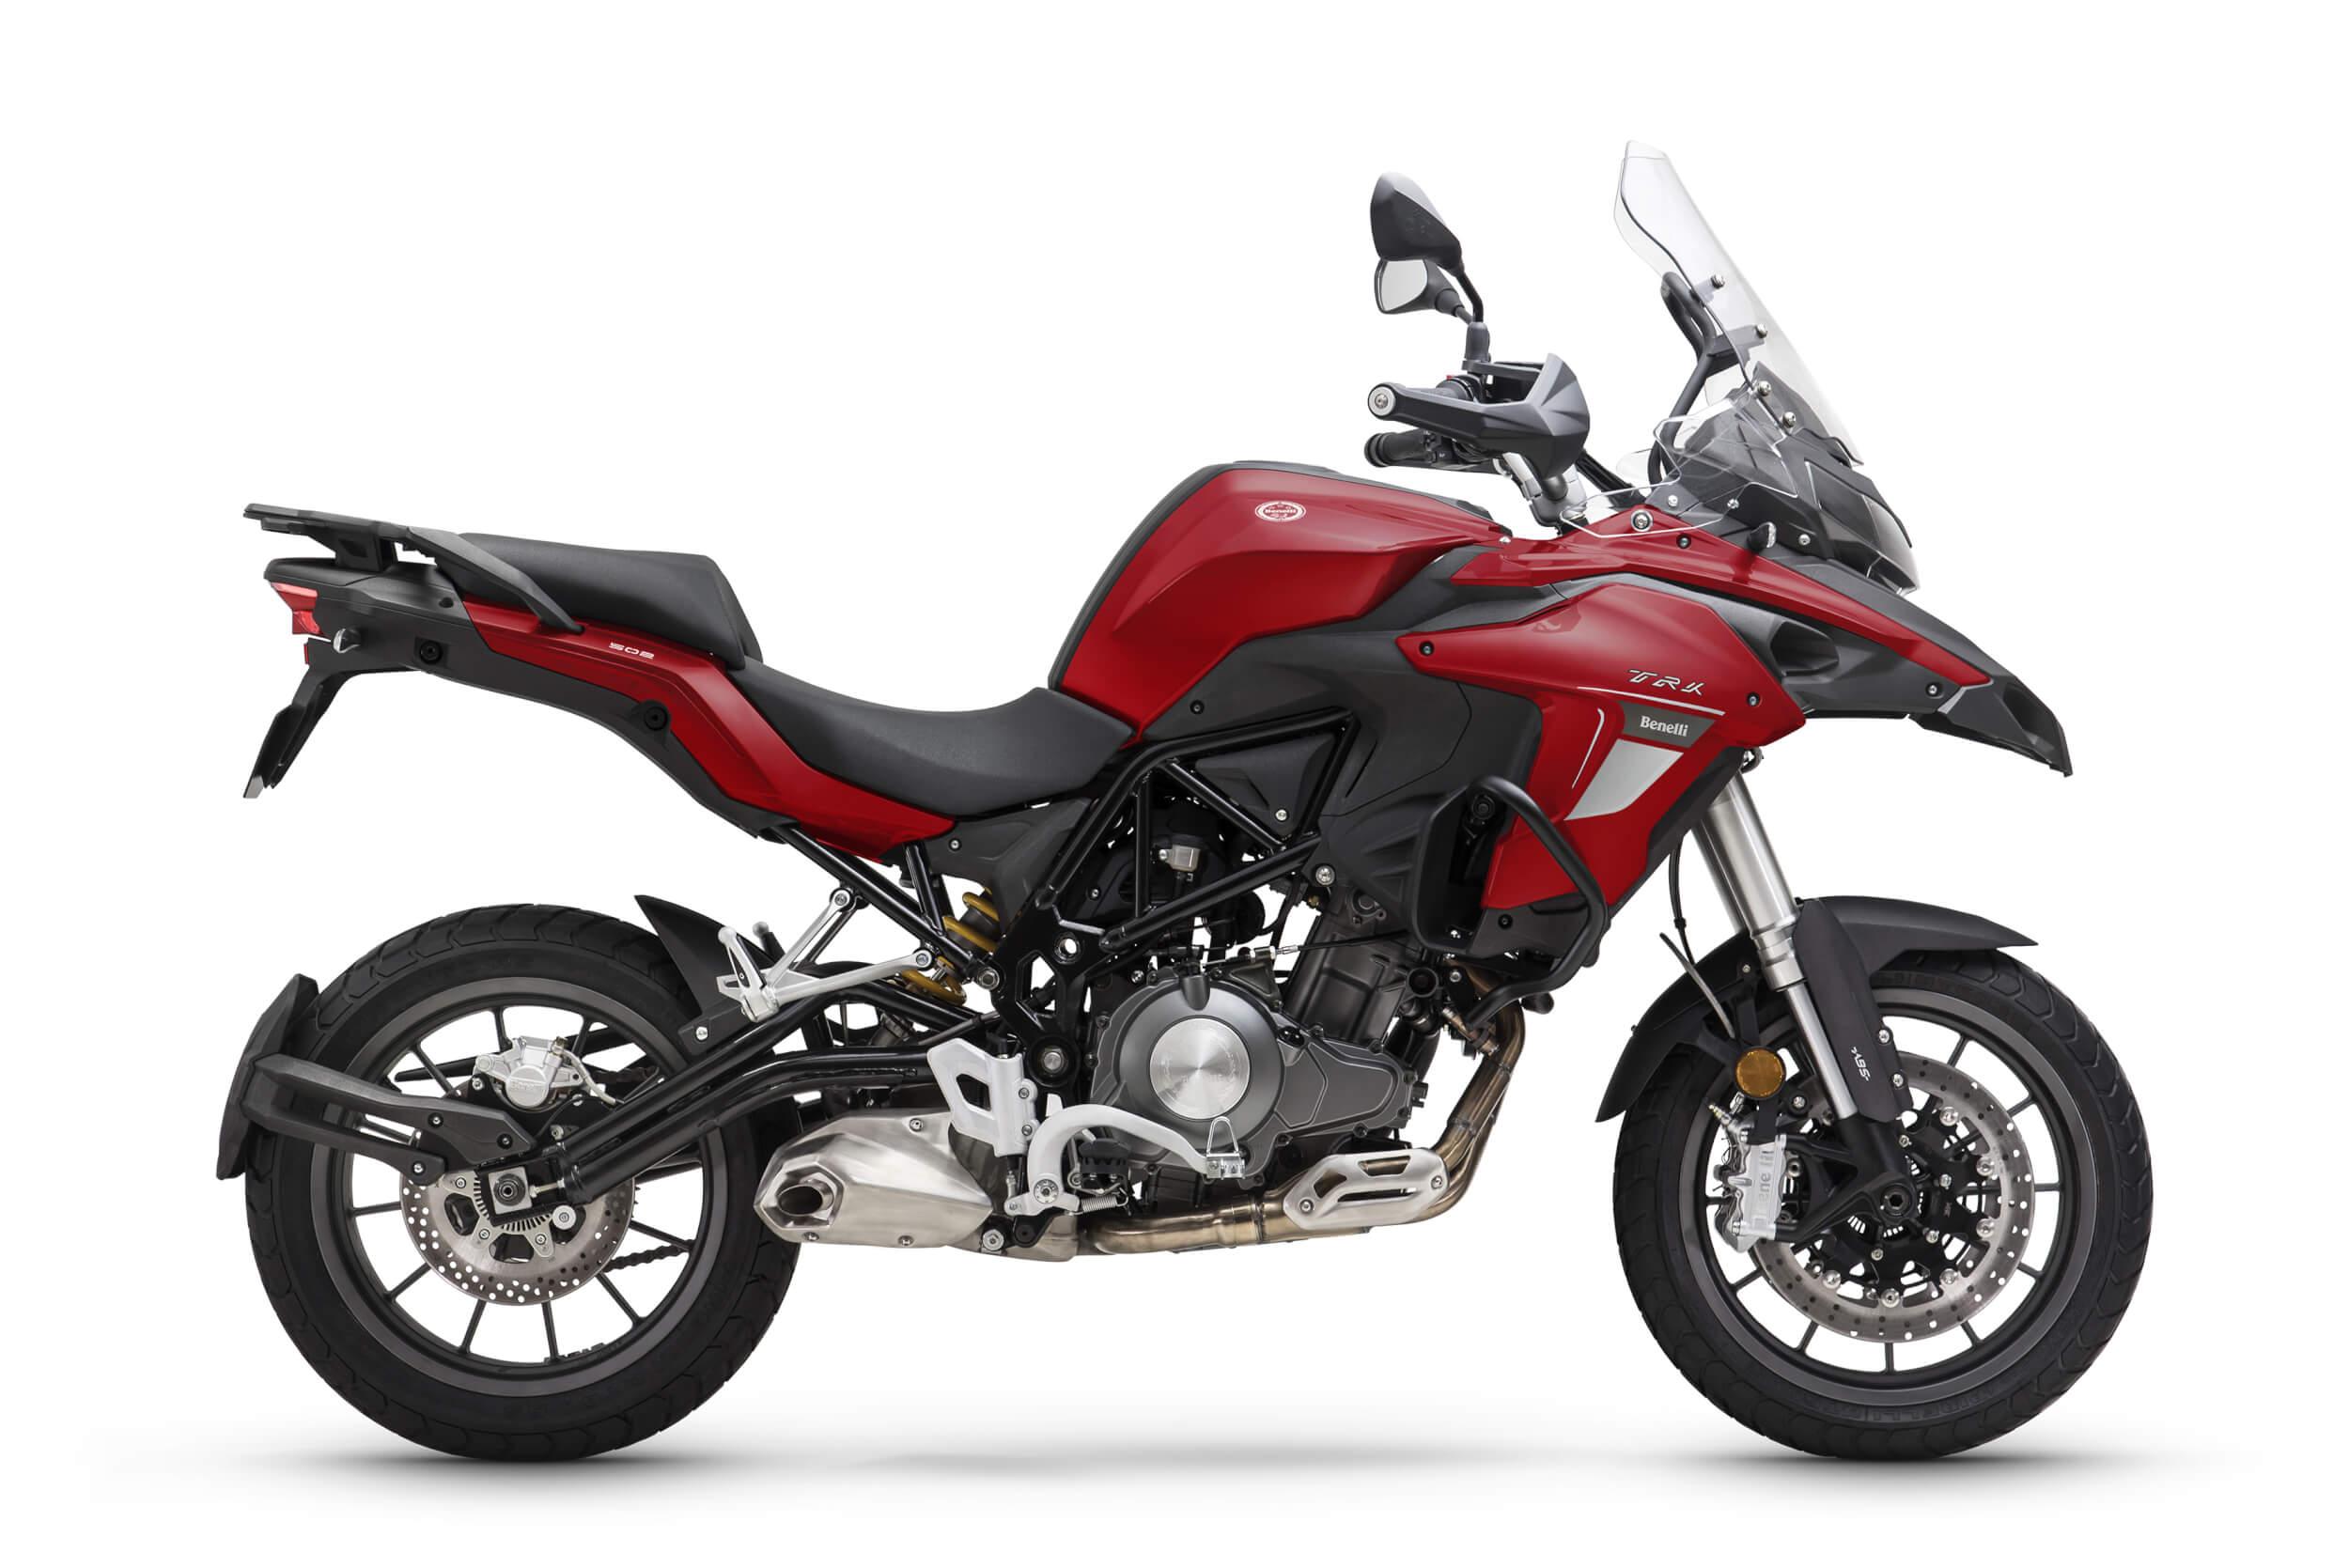 comprar-motos-benelli-trk-502-rojo-motissimo-barcelona